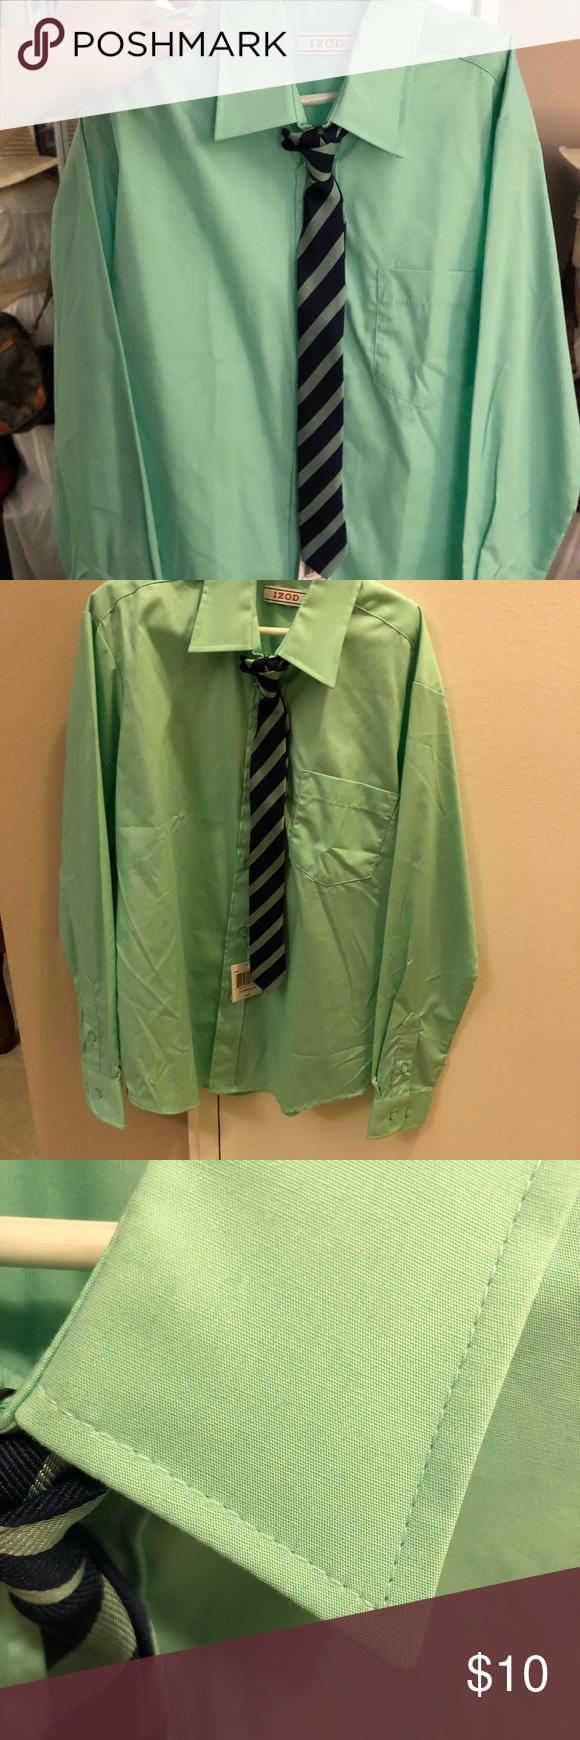 Boys Dress Shirt Mint Green Size 12 Boys Shirts Tops Button Down